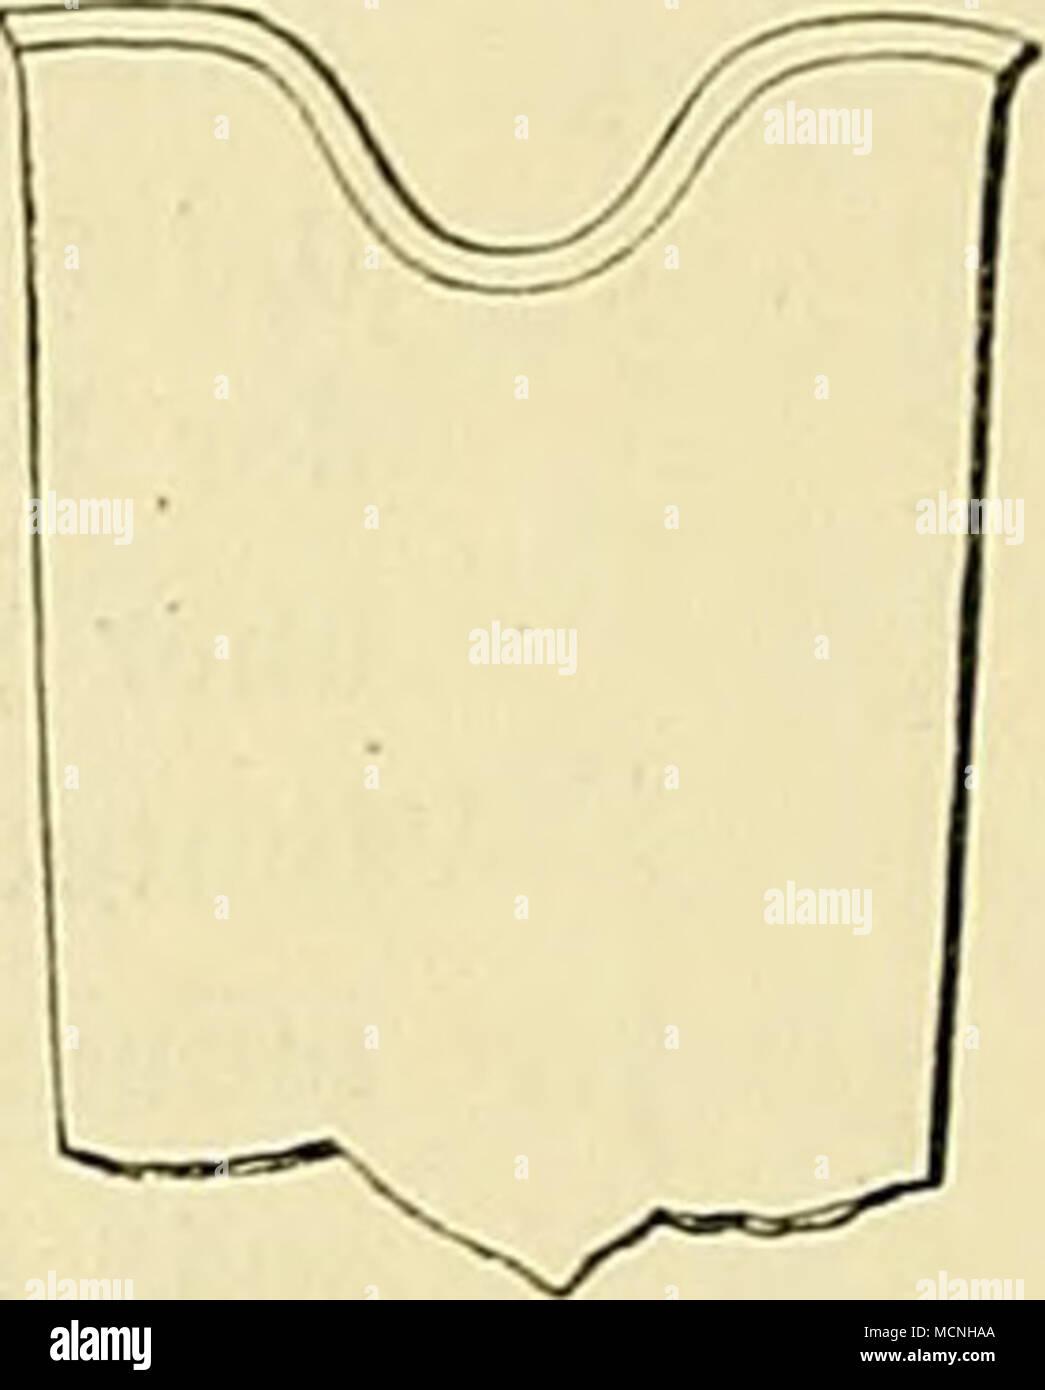 . M) Phraymoceras orthogaster Sandb. Taf. XIV. Fig. 4, 4a, 4b. Tubus purum elongulus, subfusiformis, regione ventrali fere recta, linea dorsuli sulis curva, dorso ipso transversim sutis evexa. Sectio transversalis brevi-ovula. Testa fere luevis, obsolelissime clathratu. Cellulae haud altae, singulae quueque quintum fere partem diametri dorsali-ventralis sepli efÃcientes. Cellula ultima satis magna, inÃato-conoidea, praecedens humillima. Sipho subcylindricus, radialo- lamellosus. Röhre nicht sonderlich lang-, spindelähnlich, in der Bauchgegend fast gerade; Rücken der Länge nach ziemlich gek - Stock Image